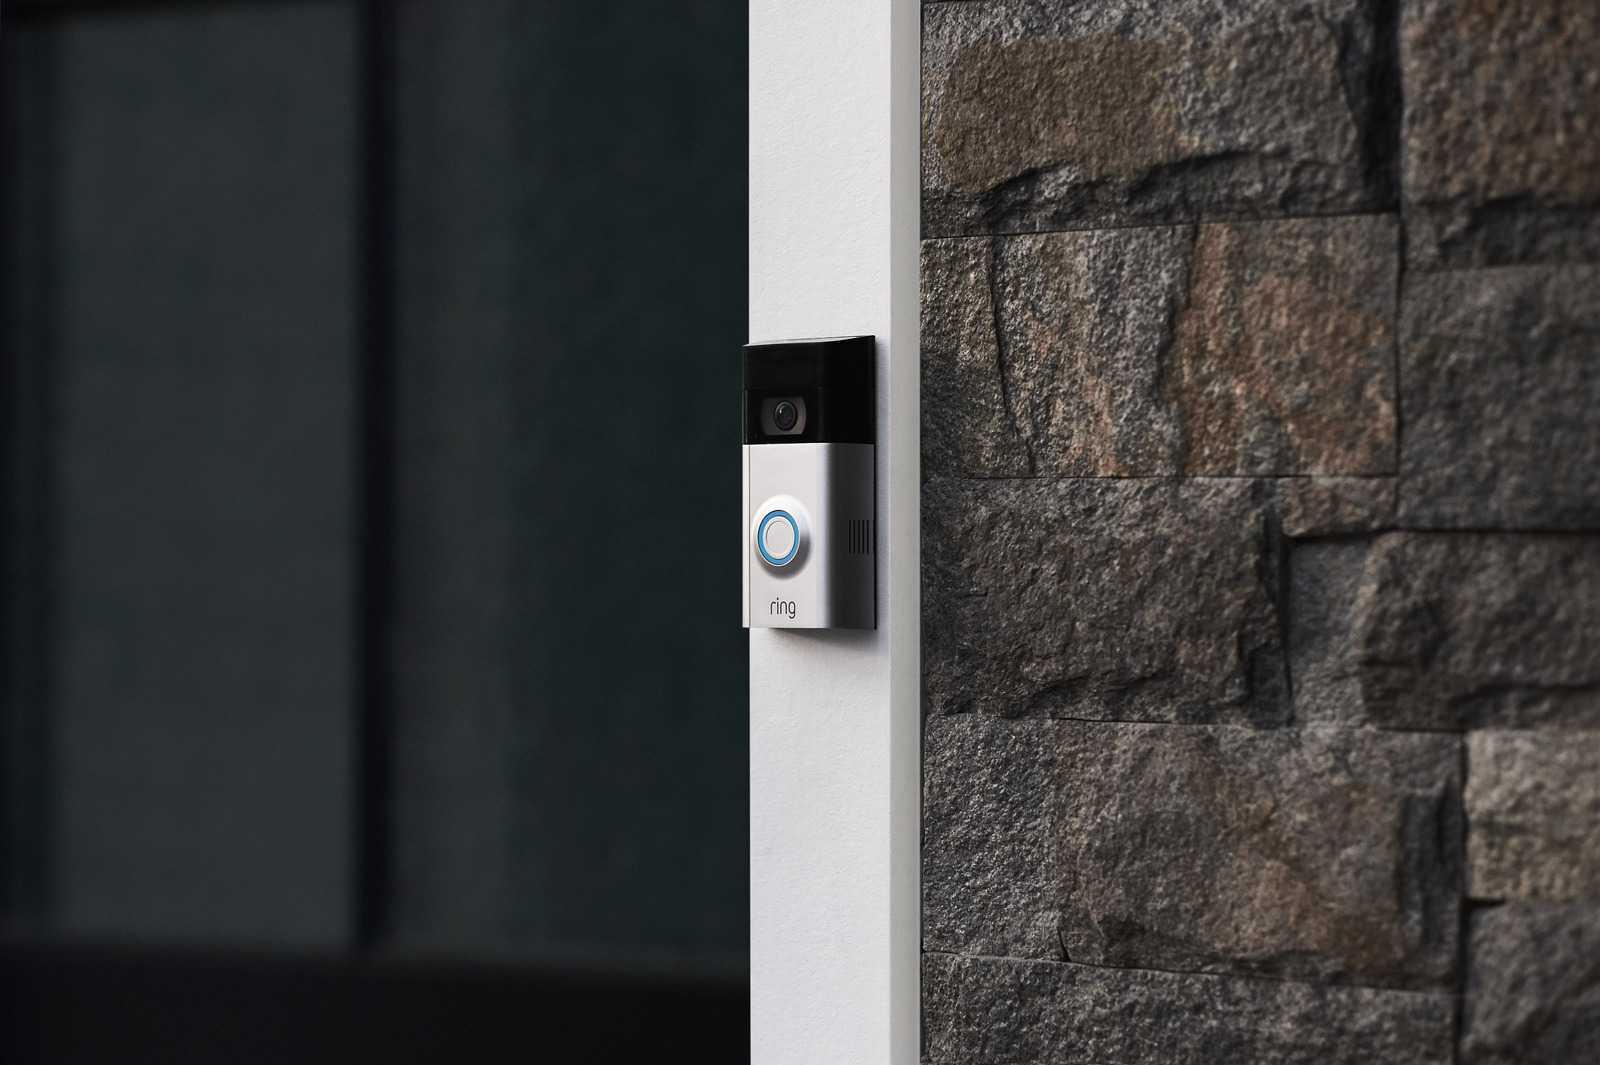 Дверной видеозвонок Ring. Фото: Ring/CC-BY-SA-4.0.